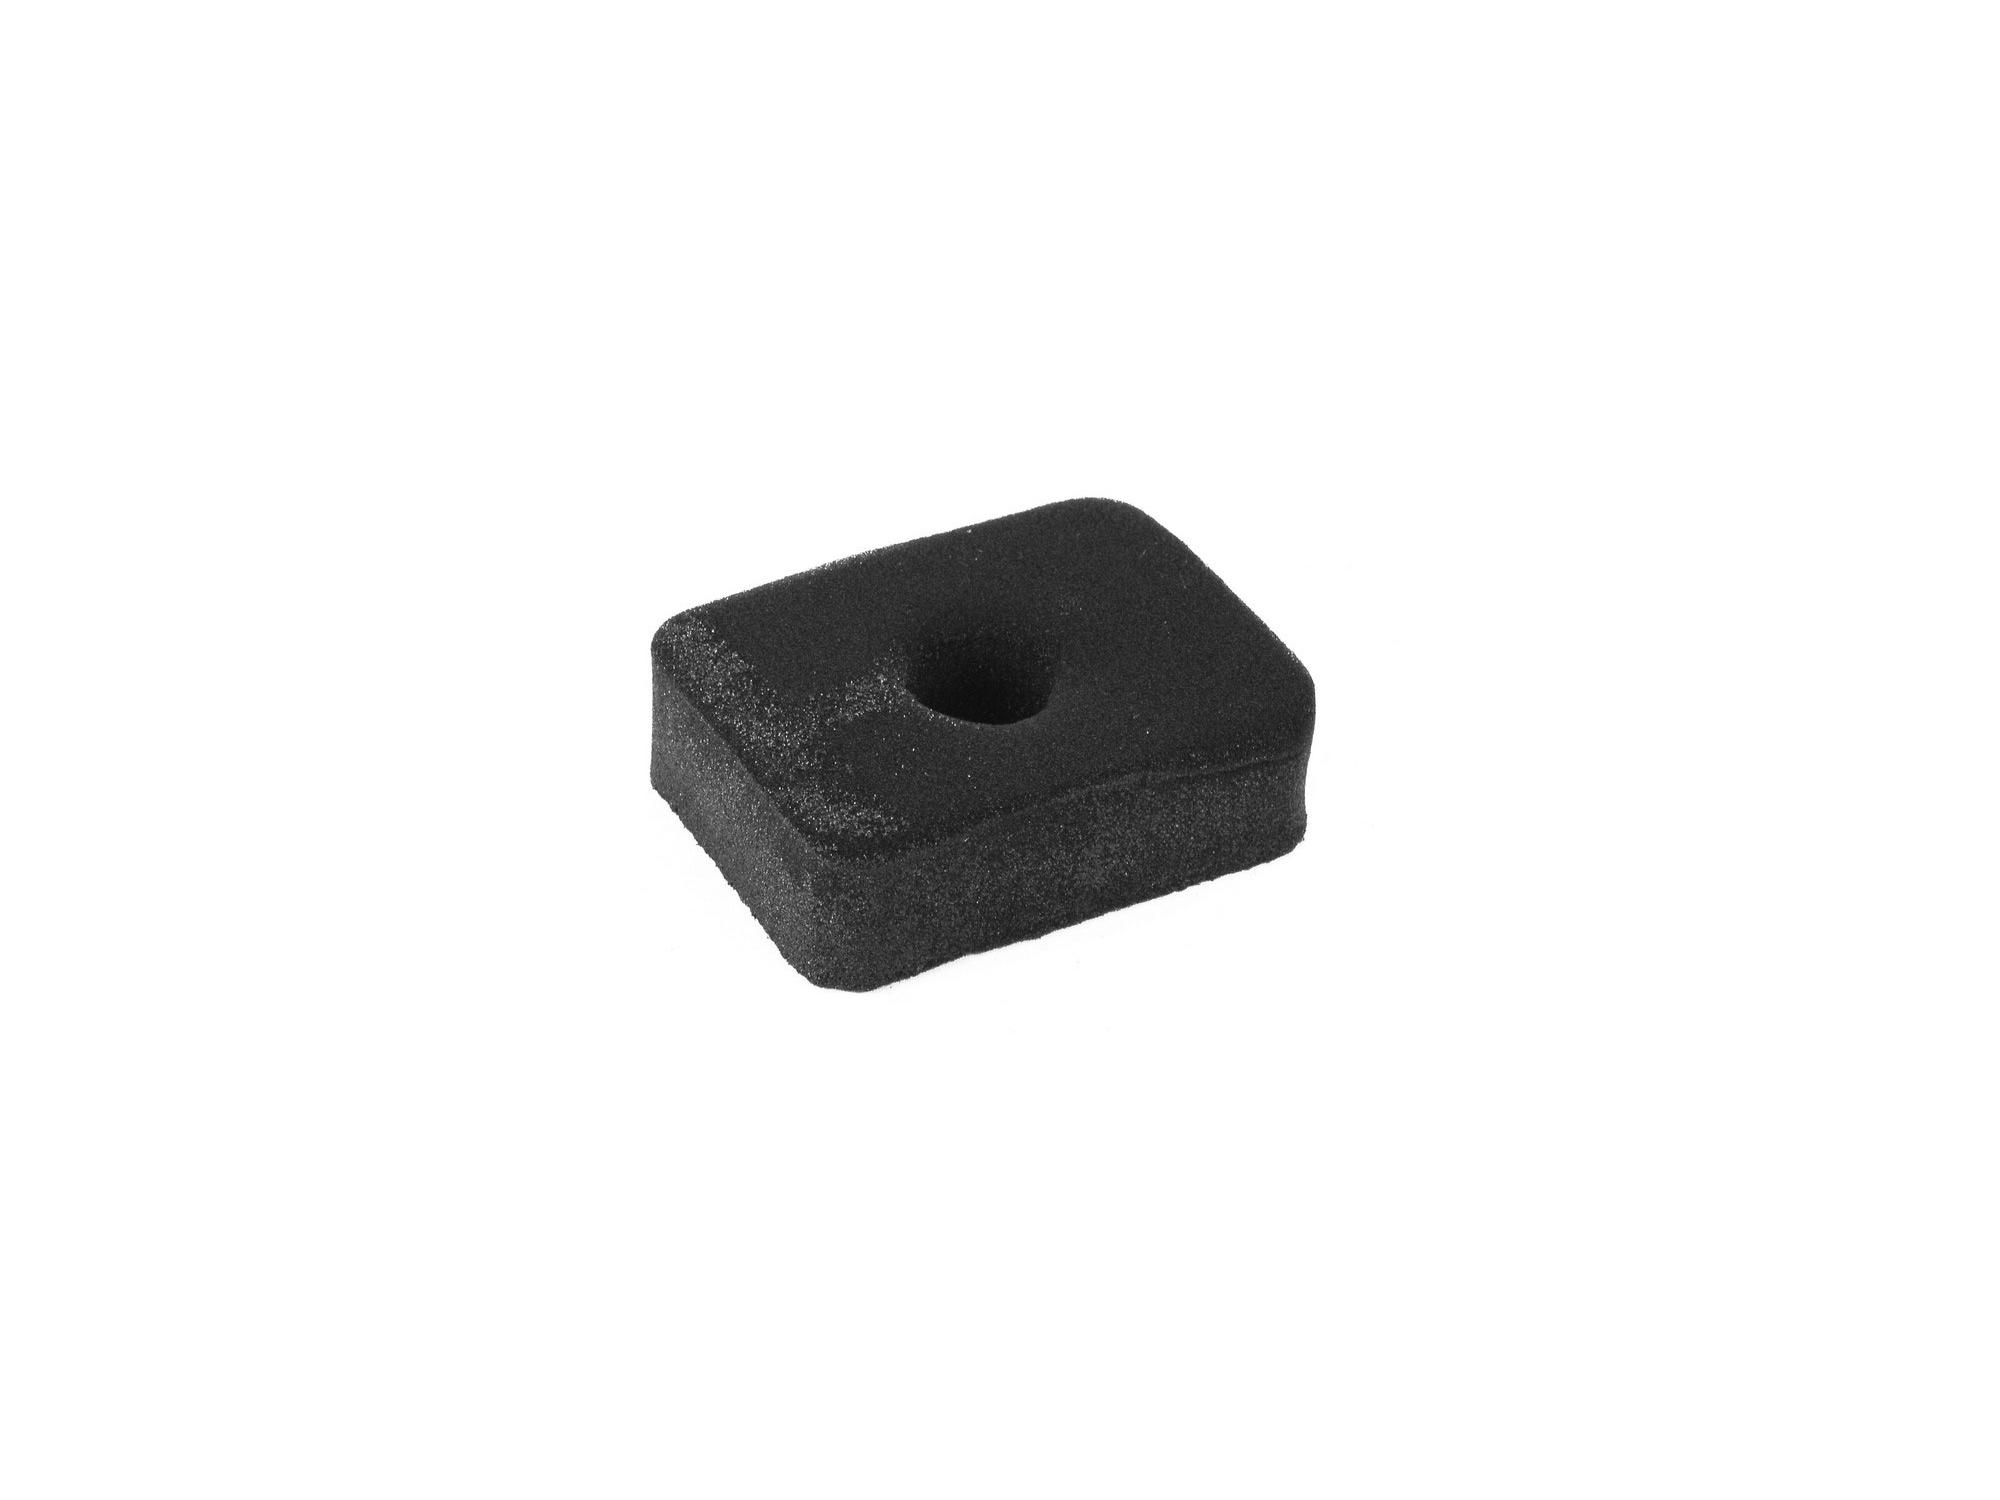 filtr vzduchový, HERON 8896112A